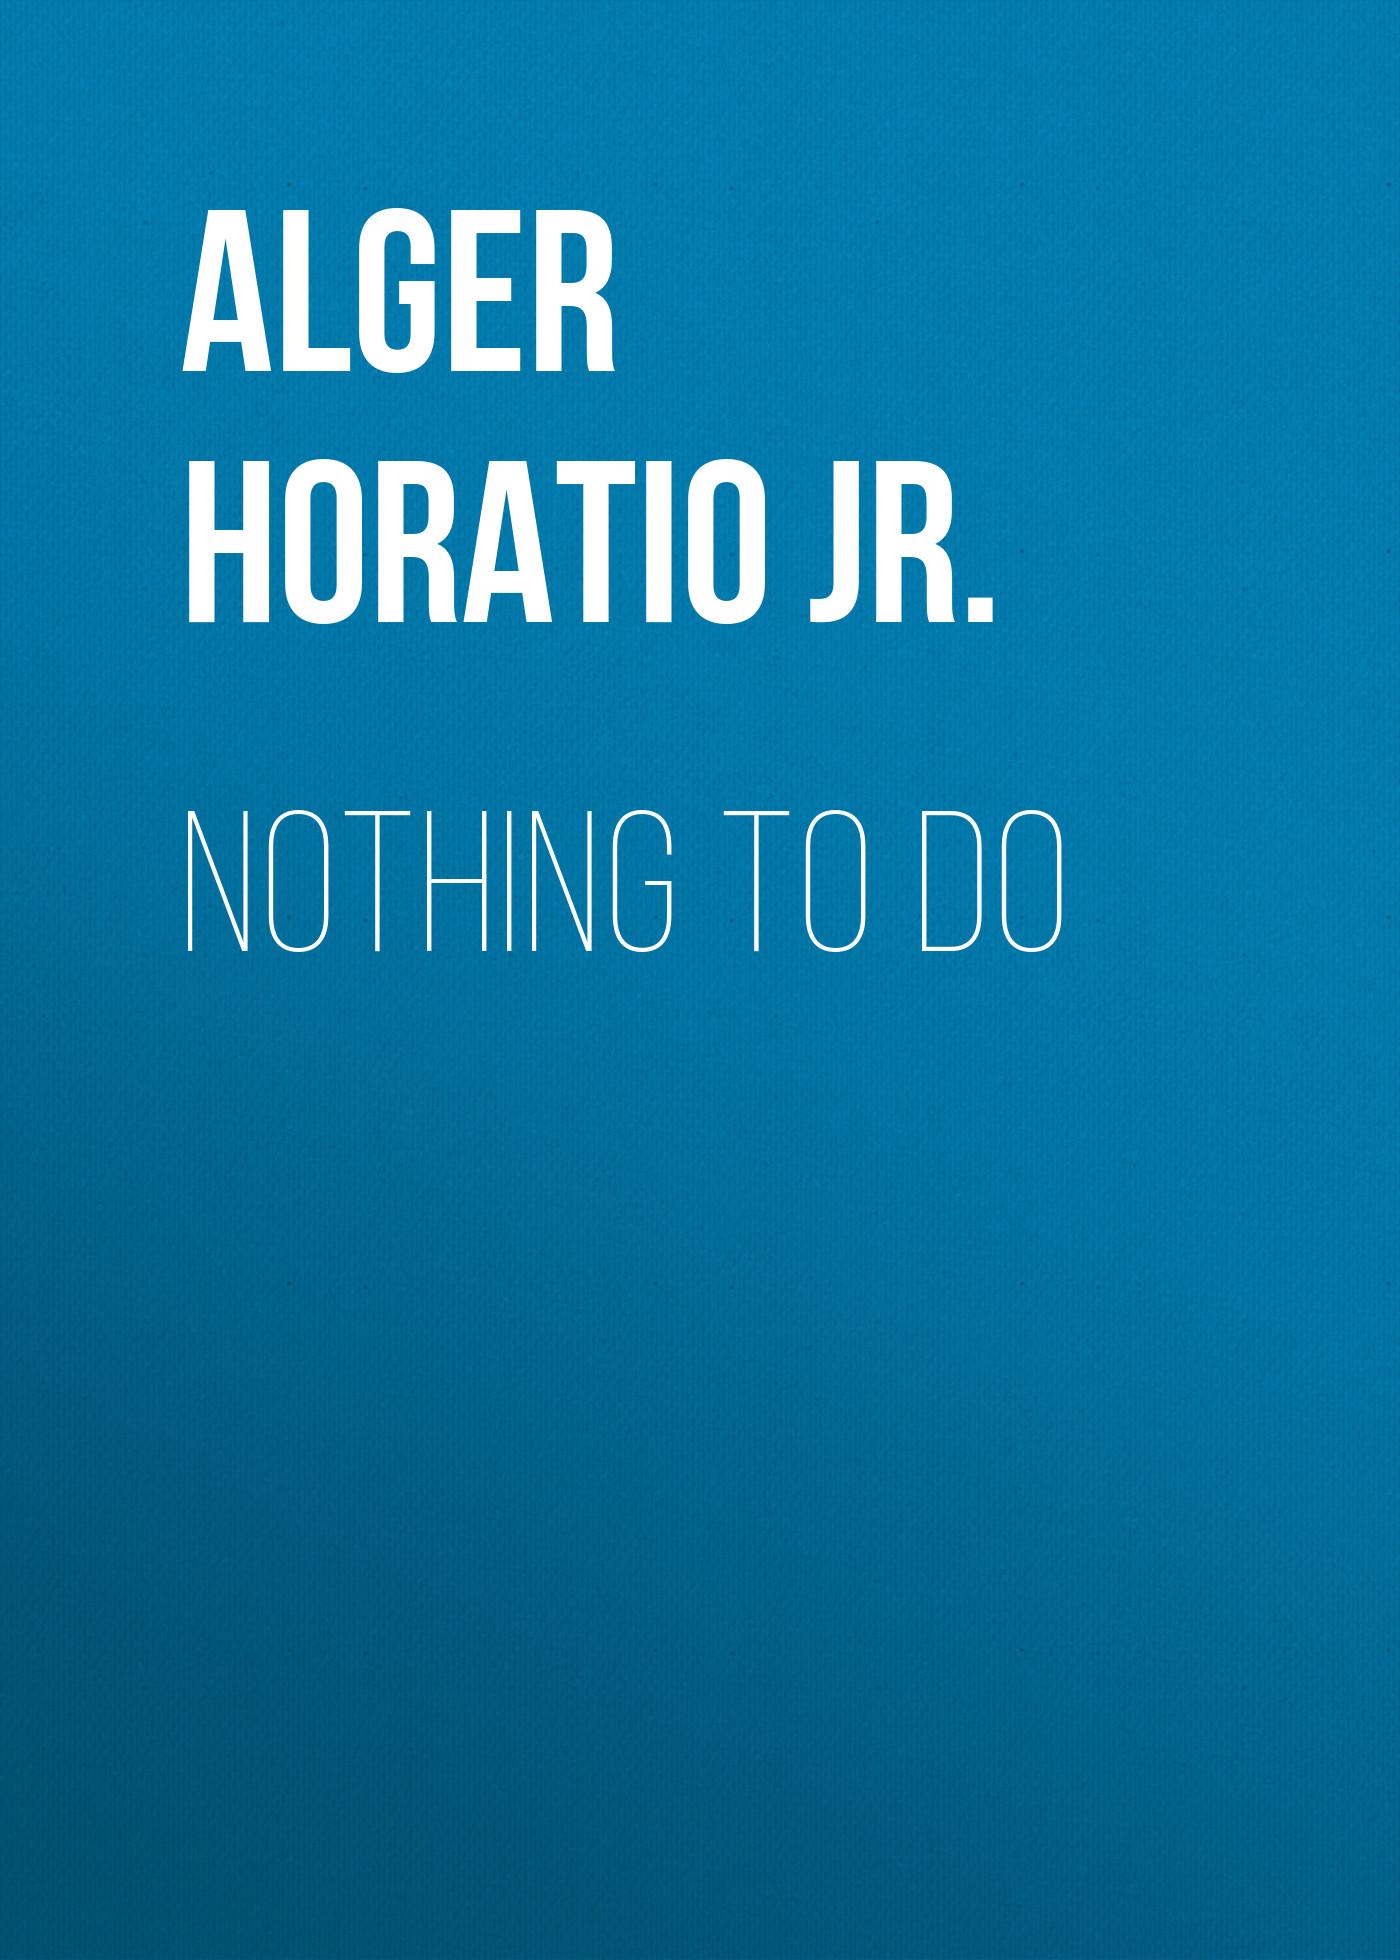 все цены на Alger Horatio Jr. Nothing to Do